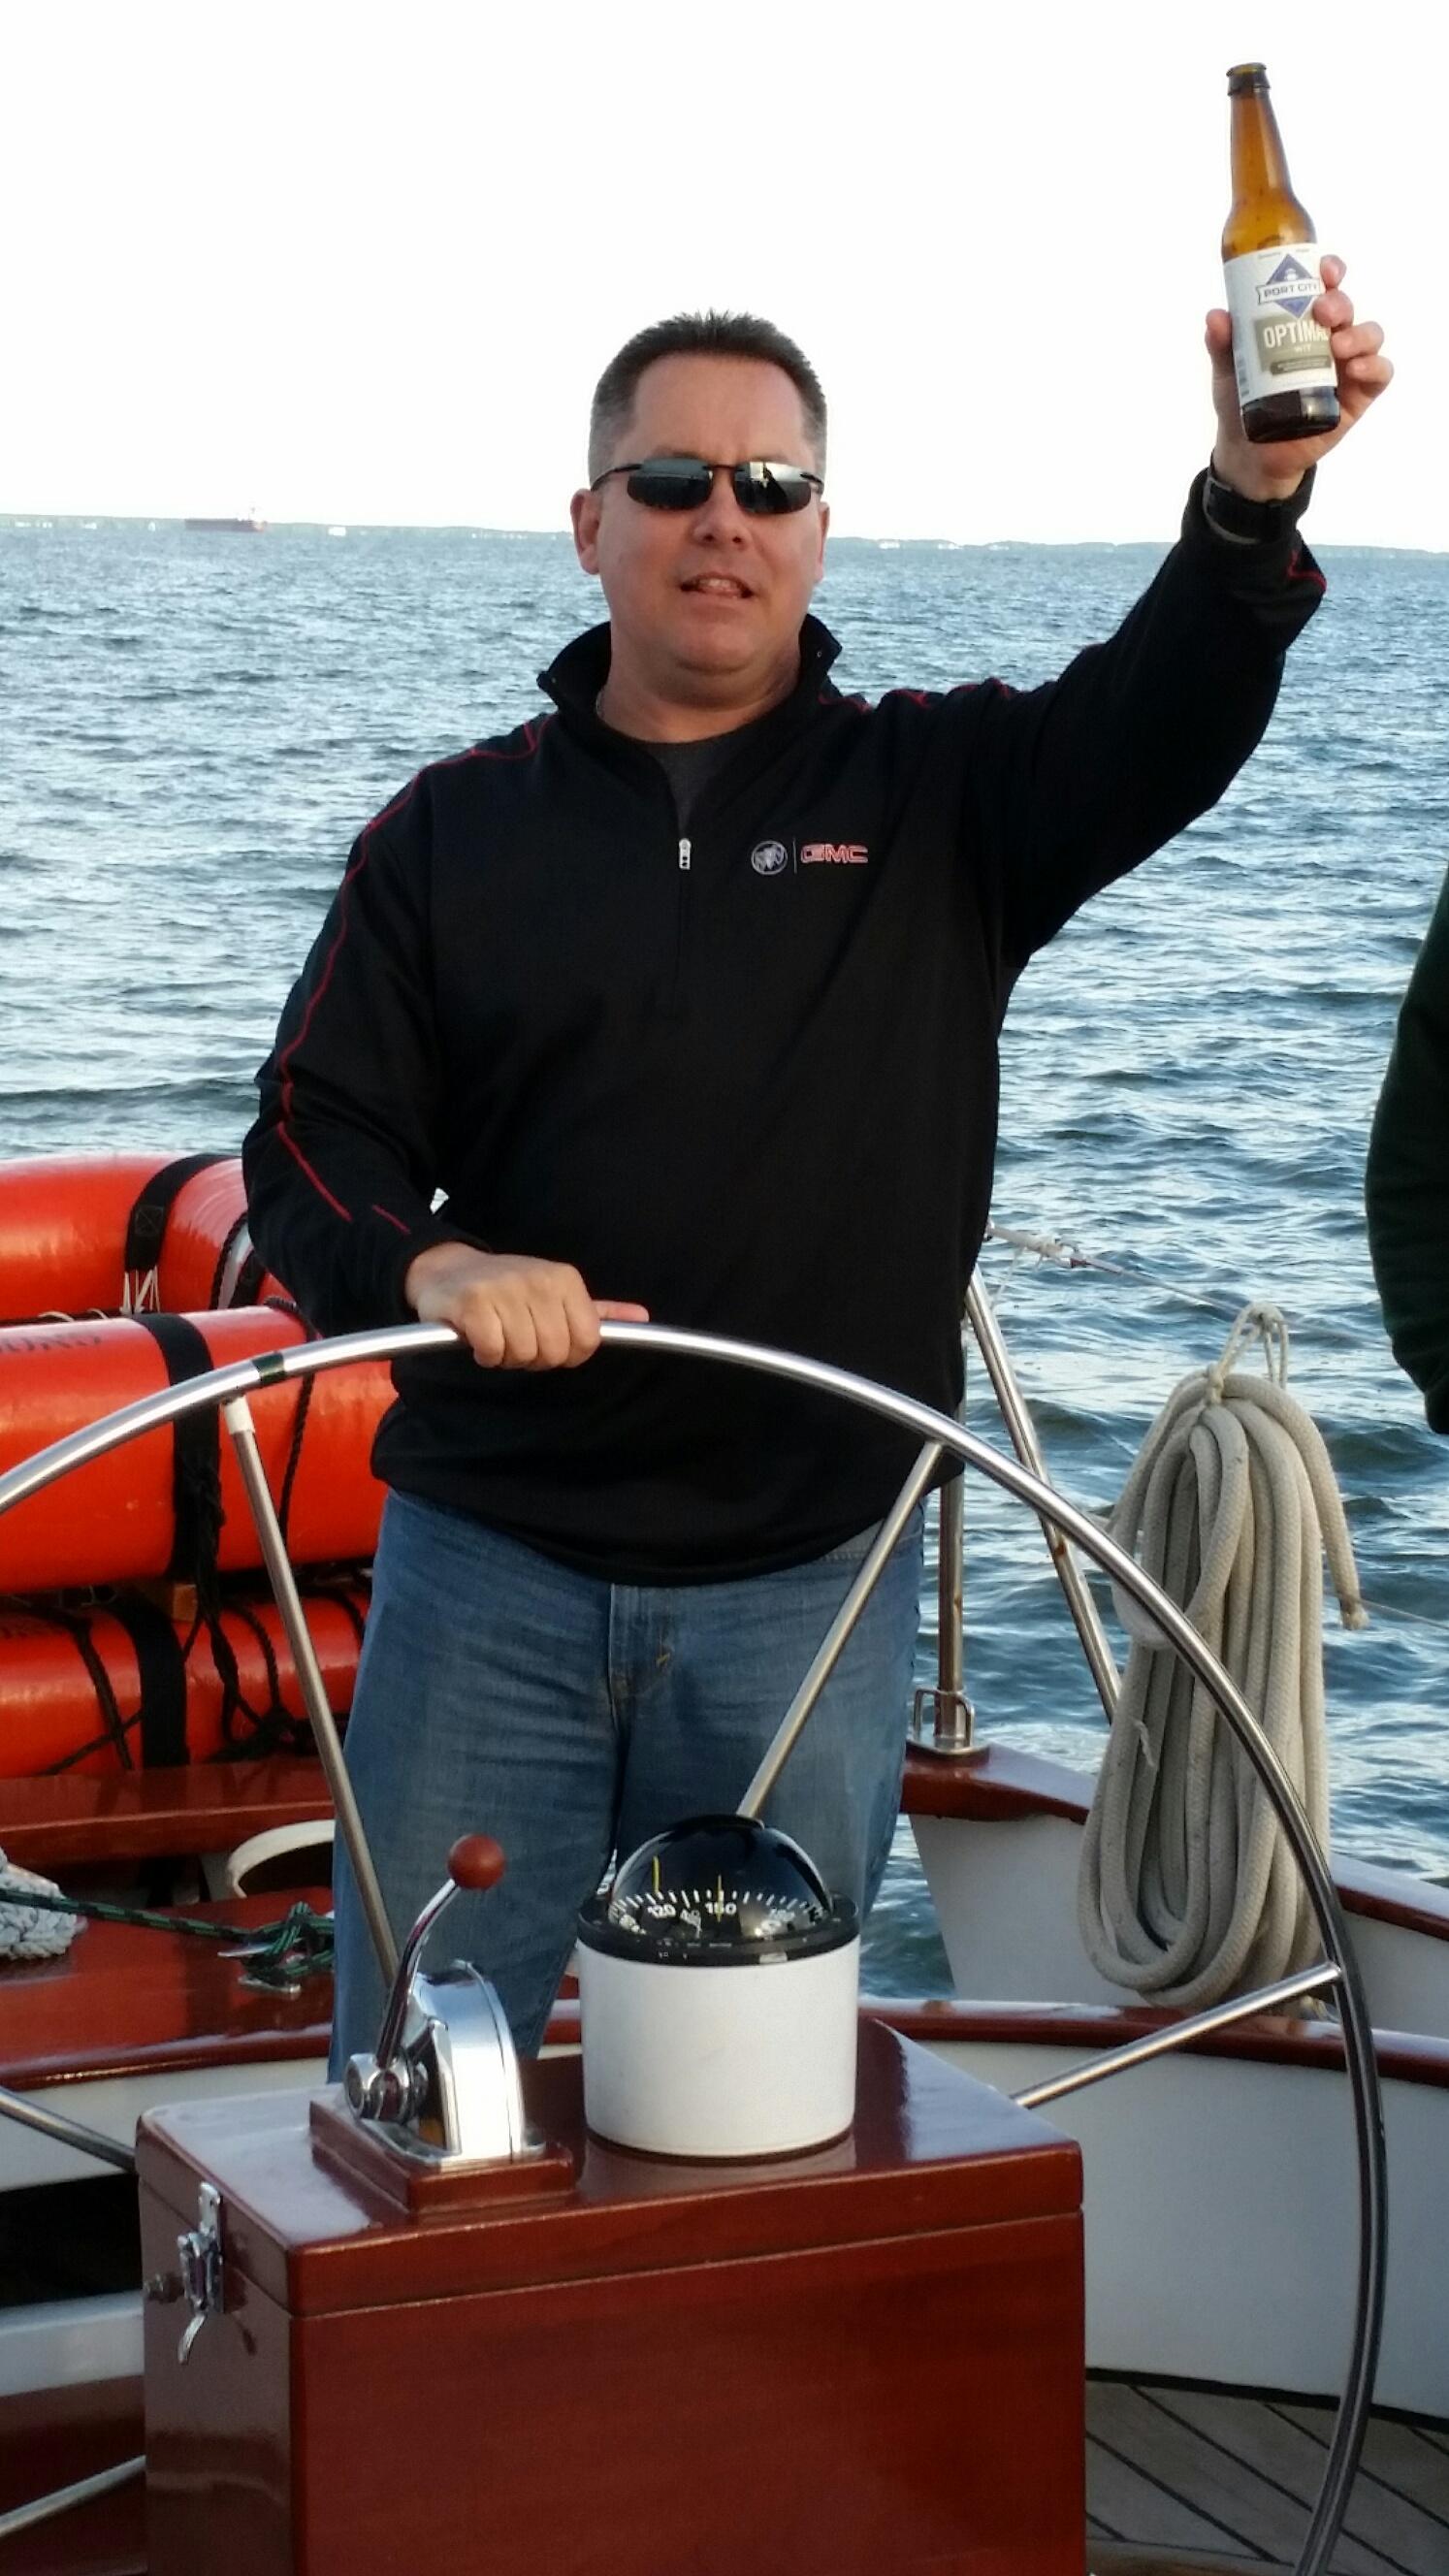 Guest steering schooner and cheering with a beer bottle